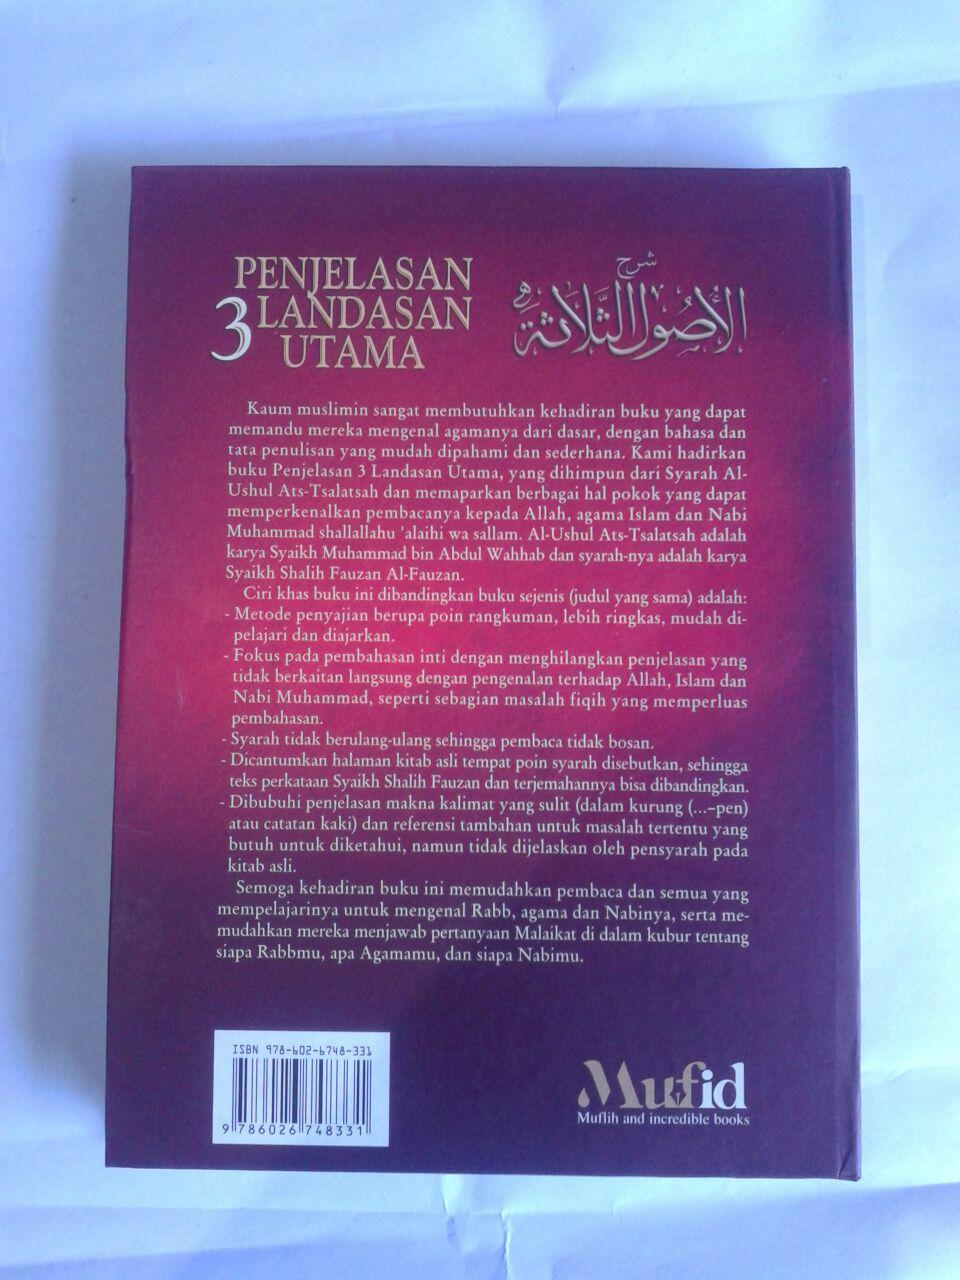 Buku Penjelasan 3 Landasan Utama Hard Cover cover